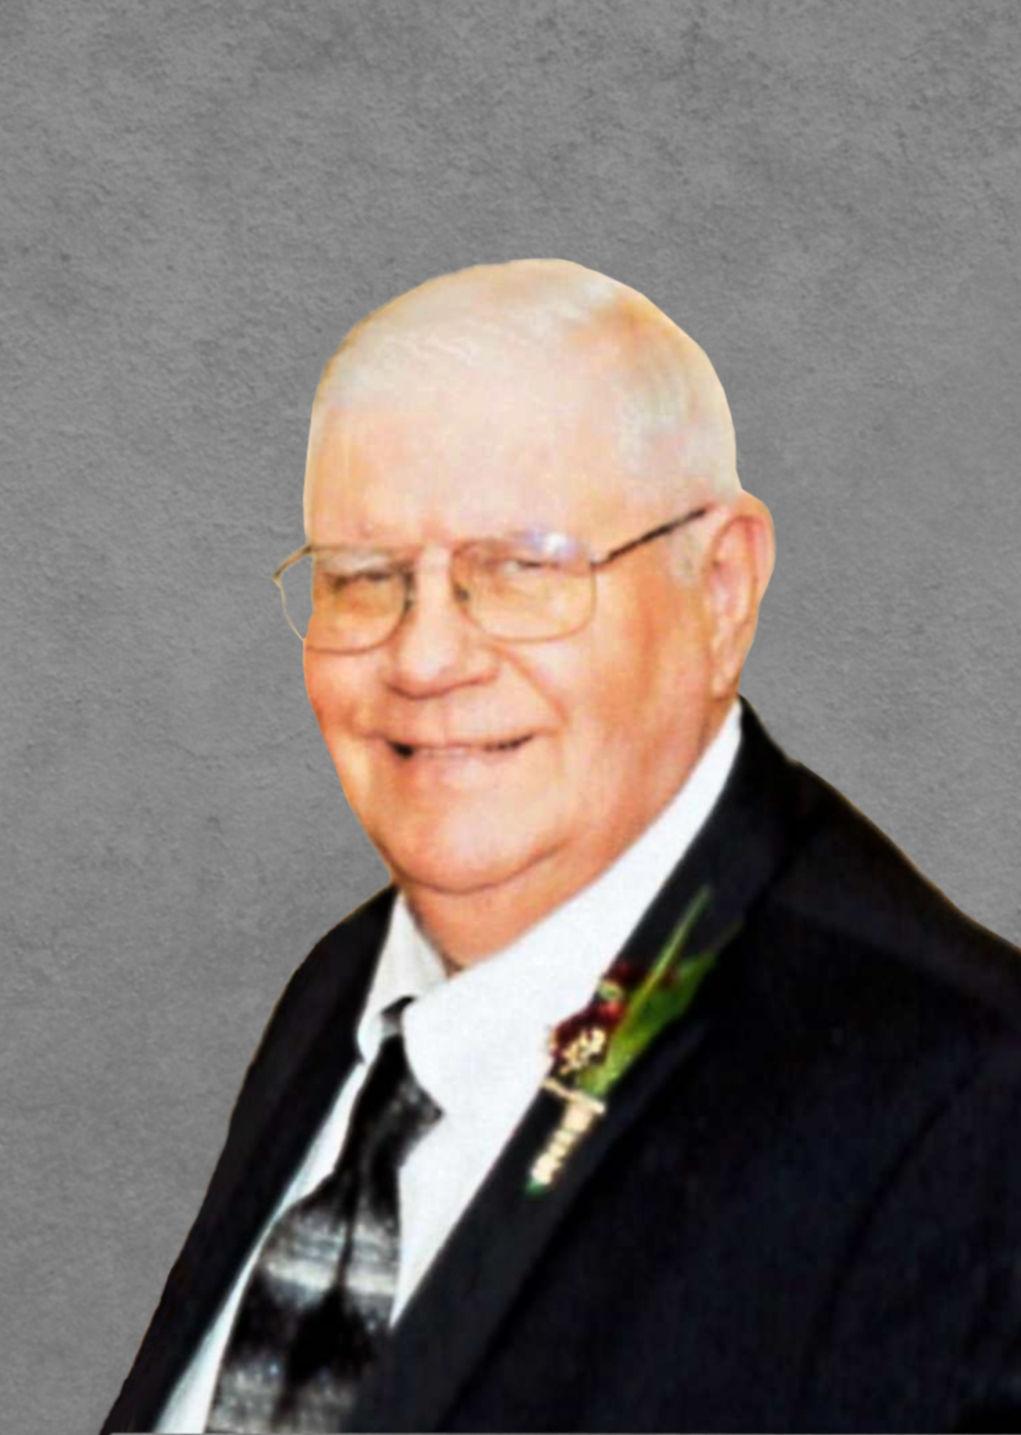 Jim Bartelson